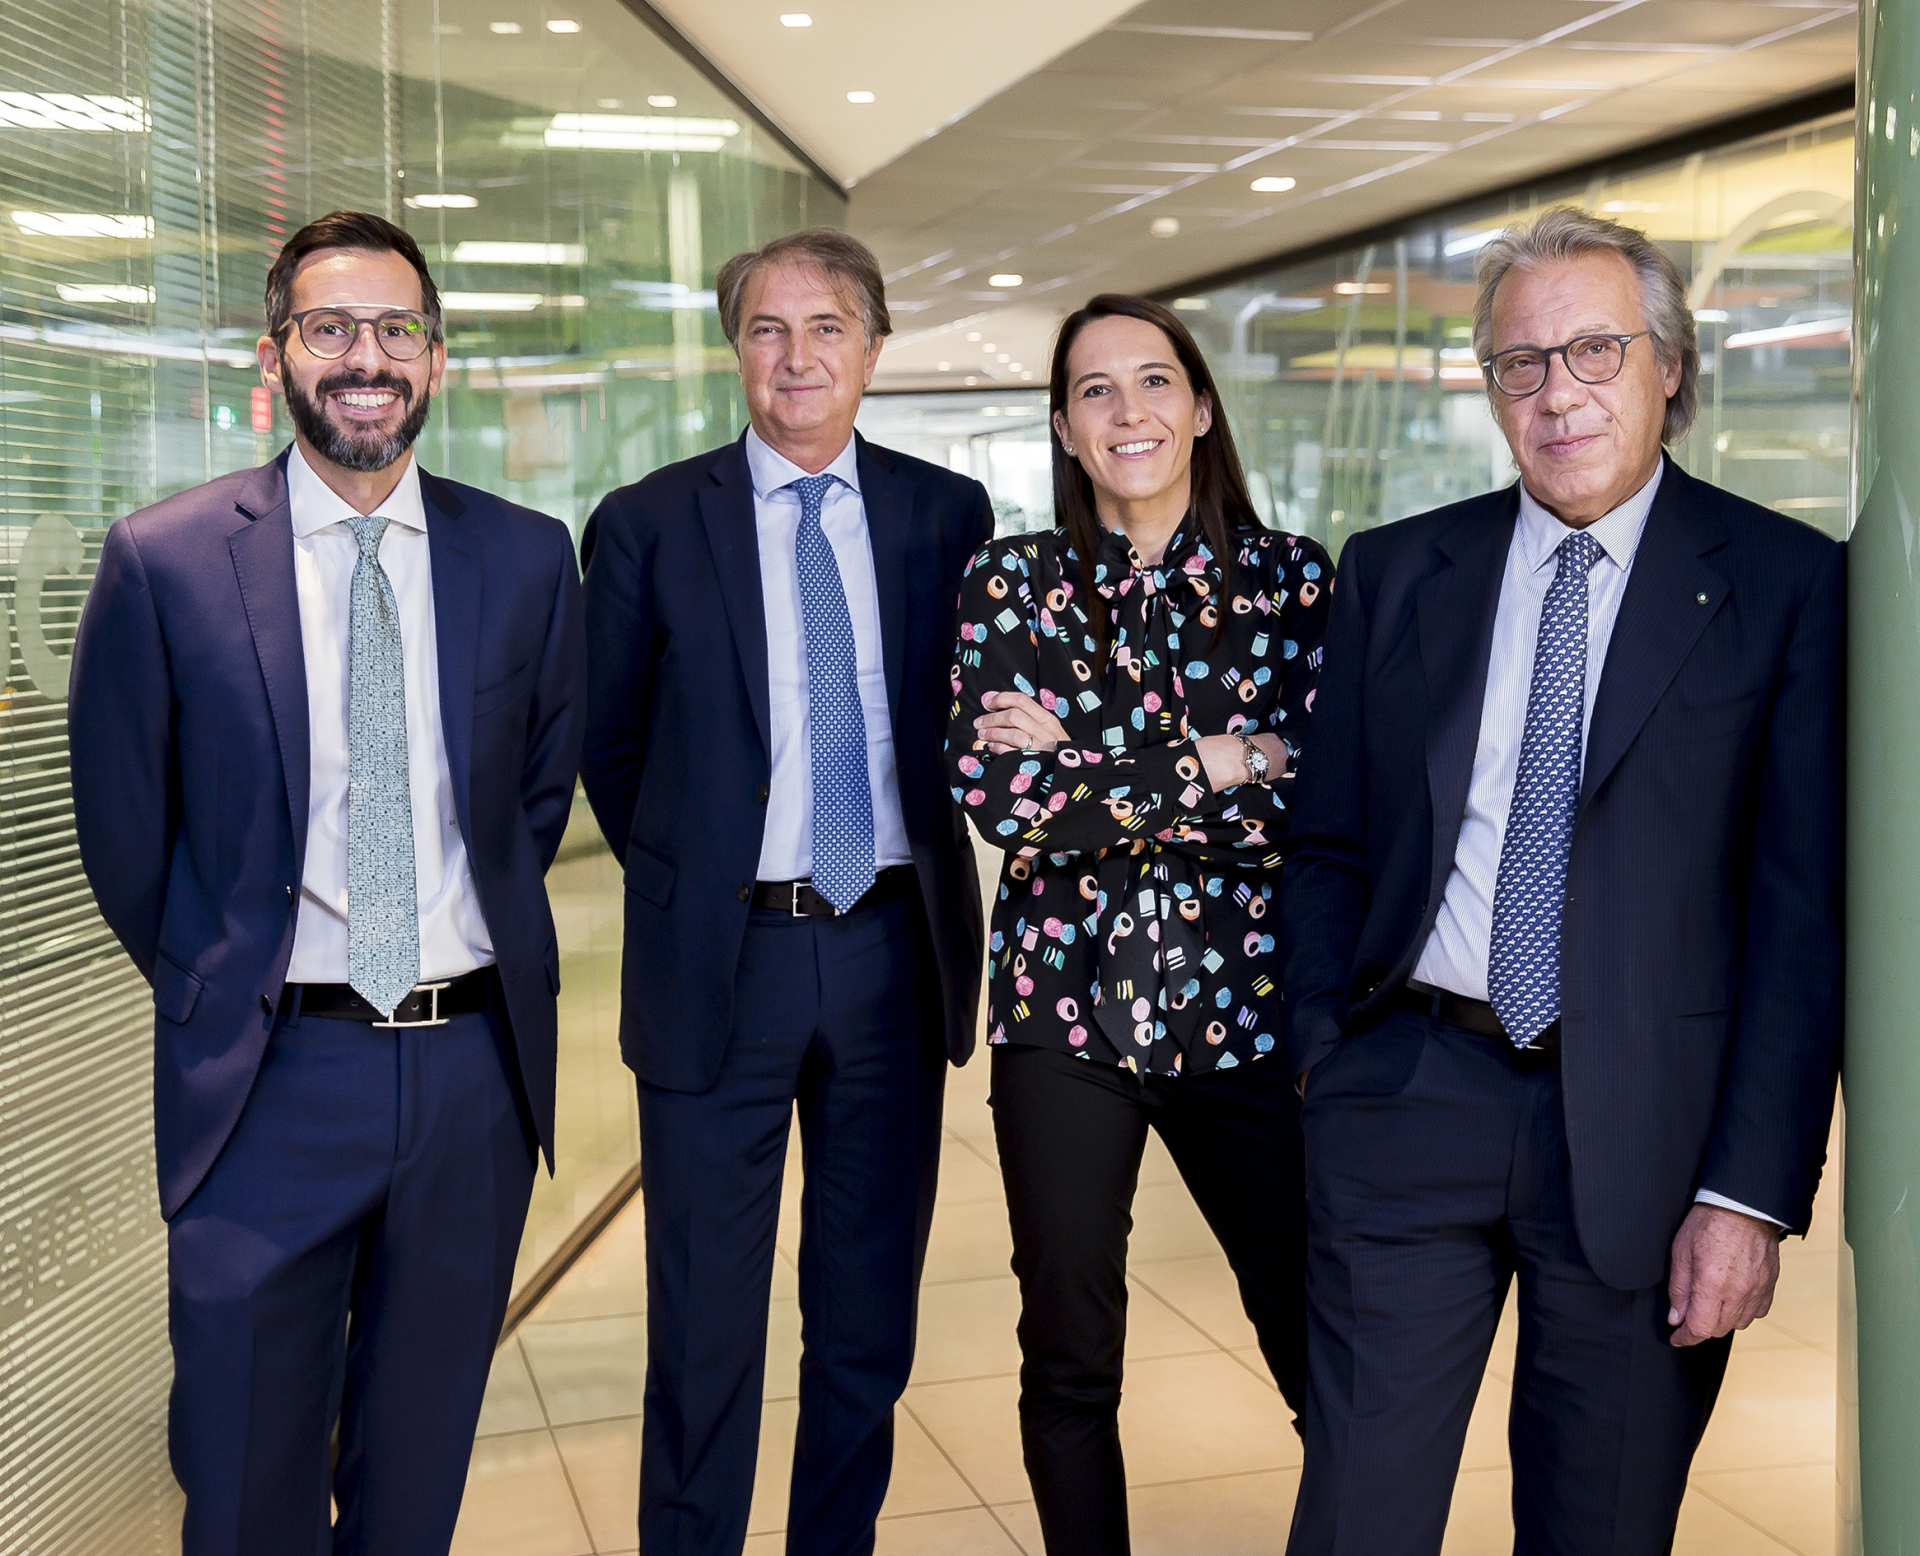 La Fratelli Carli a sostegno del sistema sanitario dona 100 mila euro